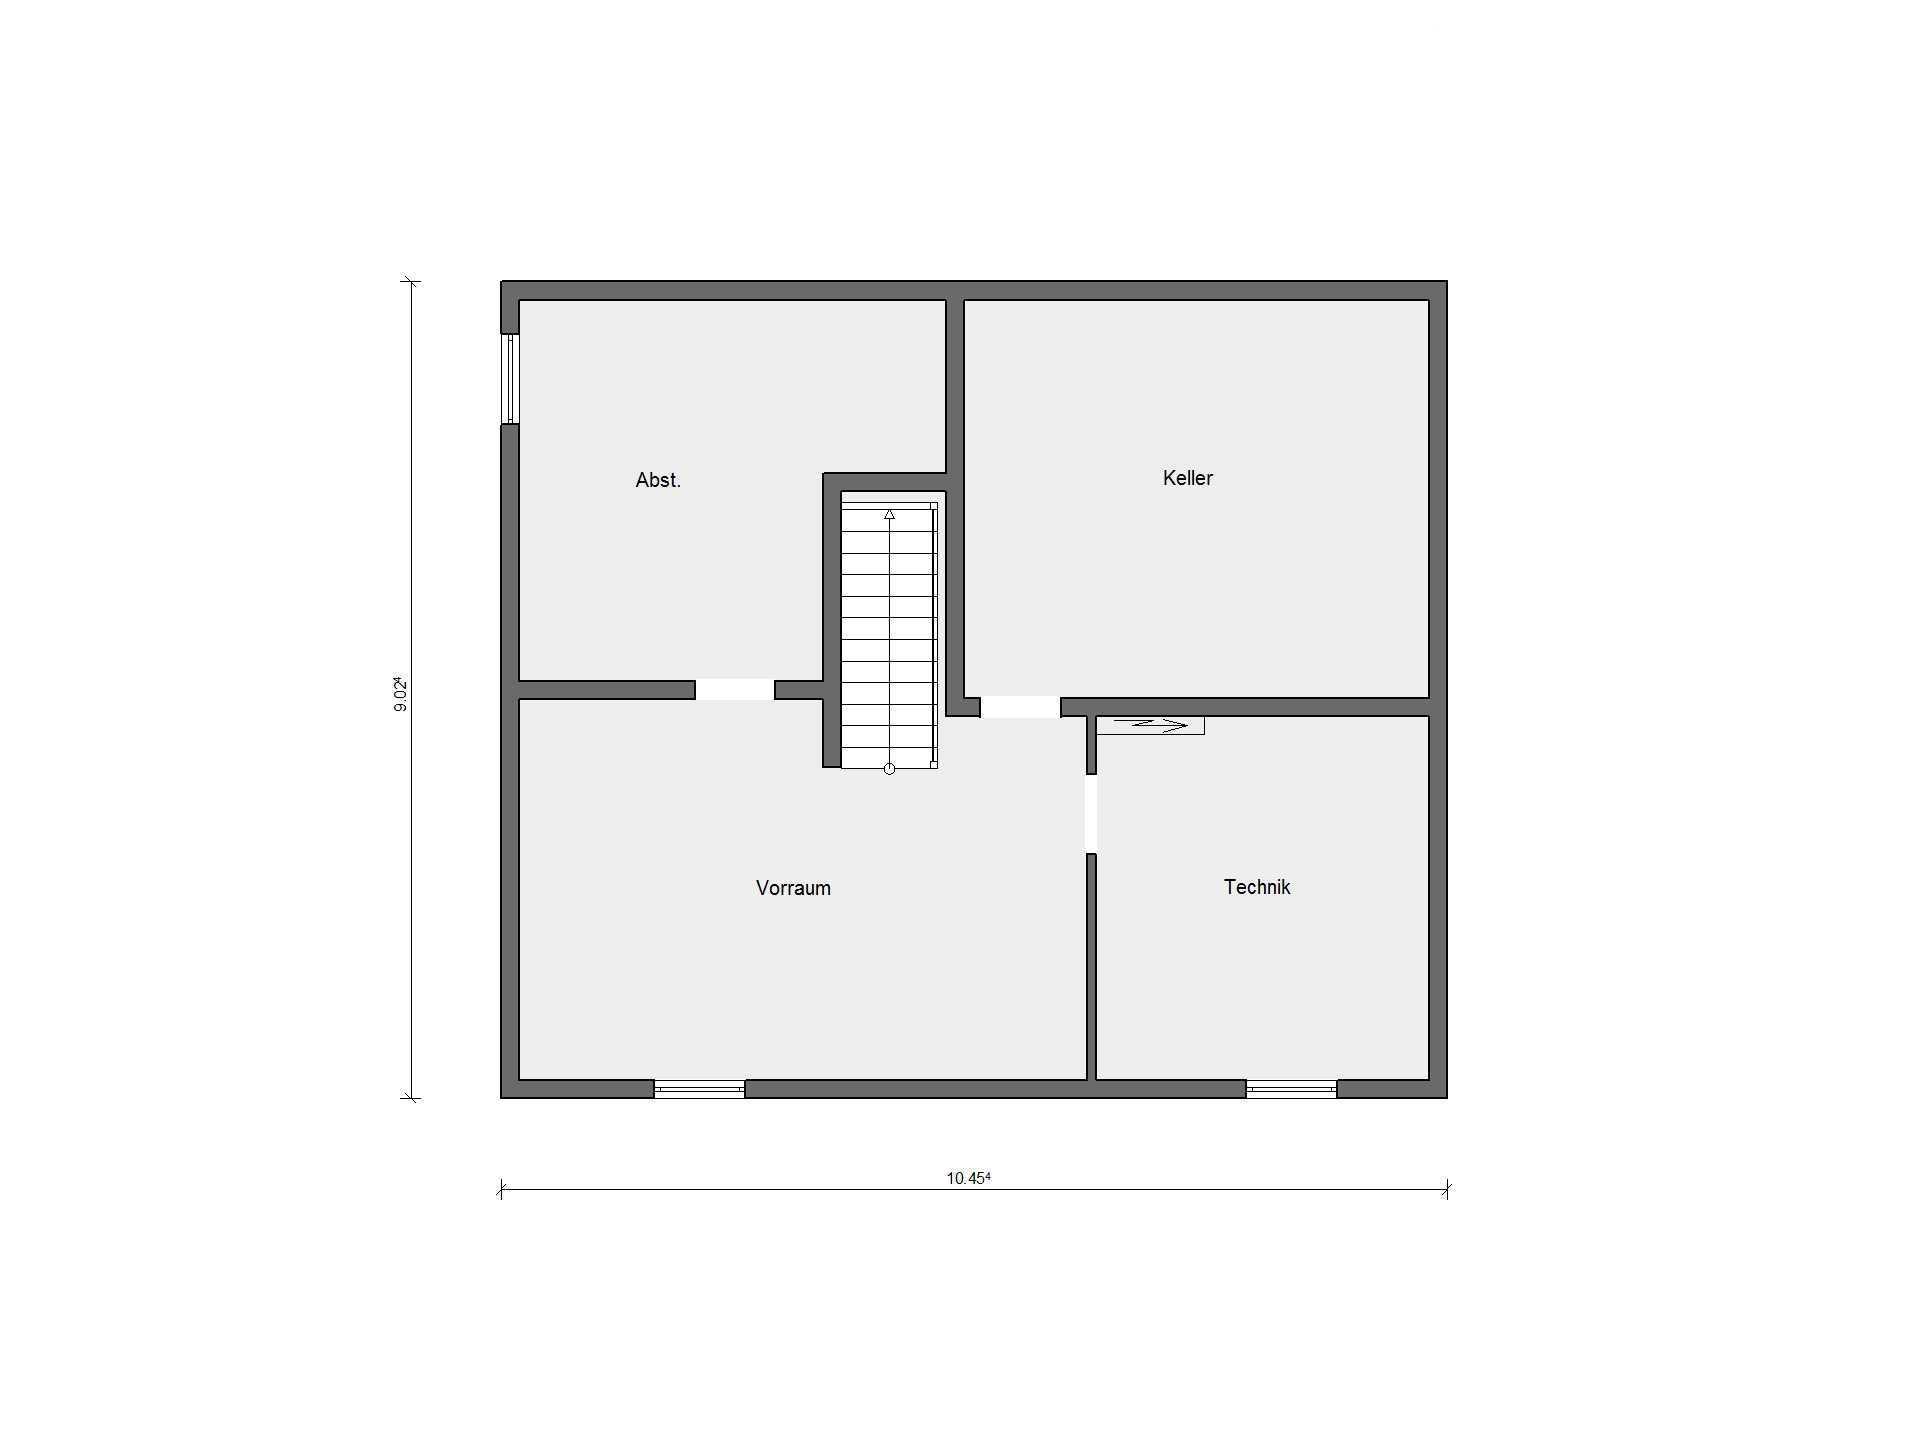 Musterhaus Schöner Wohnen Haus Schwörerhaus Musterhausnet